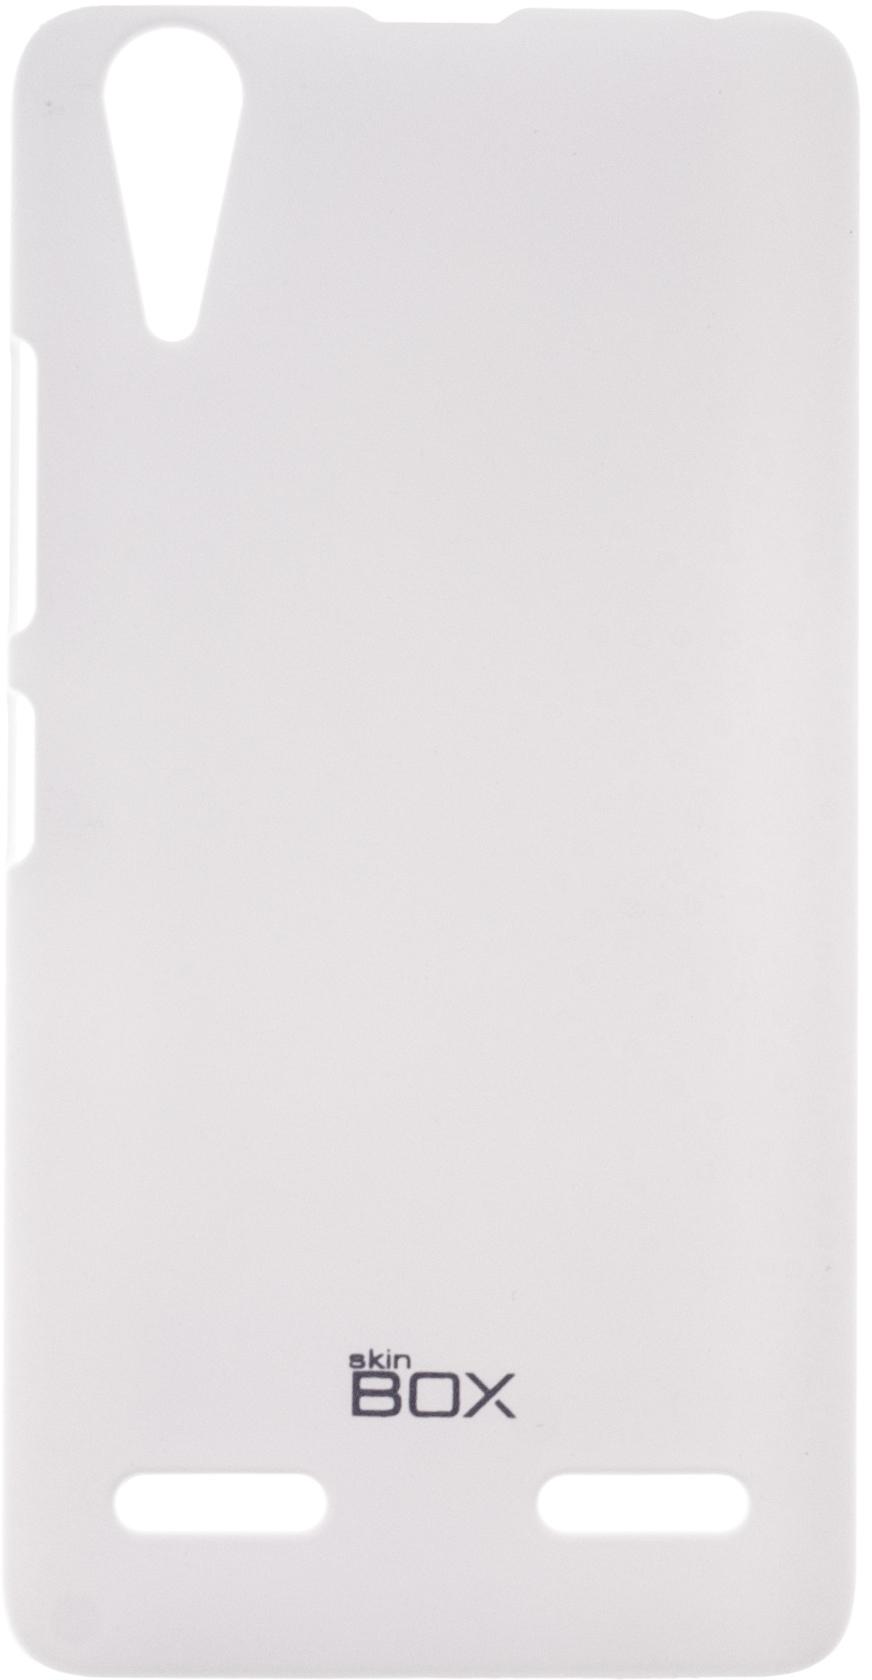 SkinBox ��� Lenovo A6000/6010 P-S-LA6000-002 �����